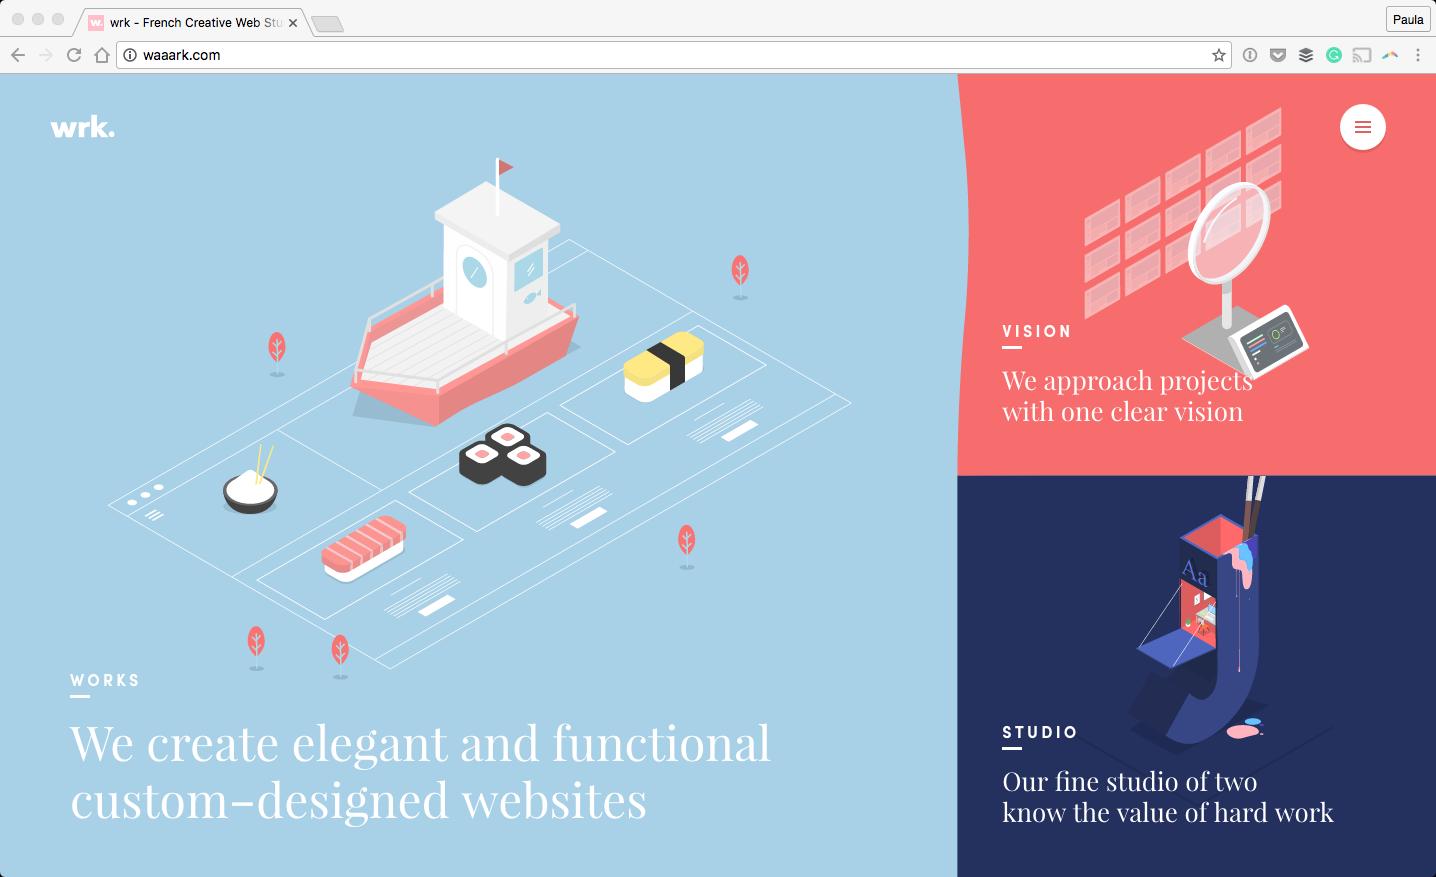 wrk-french-creative-web-studio-2016-09-30-21-25-01